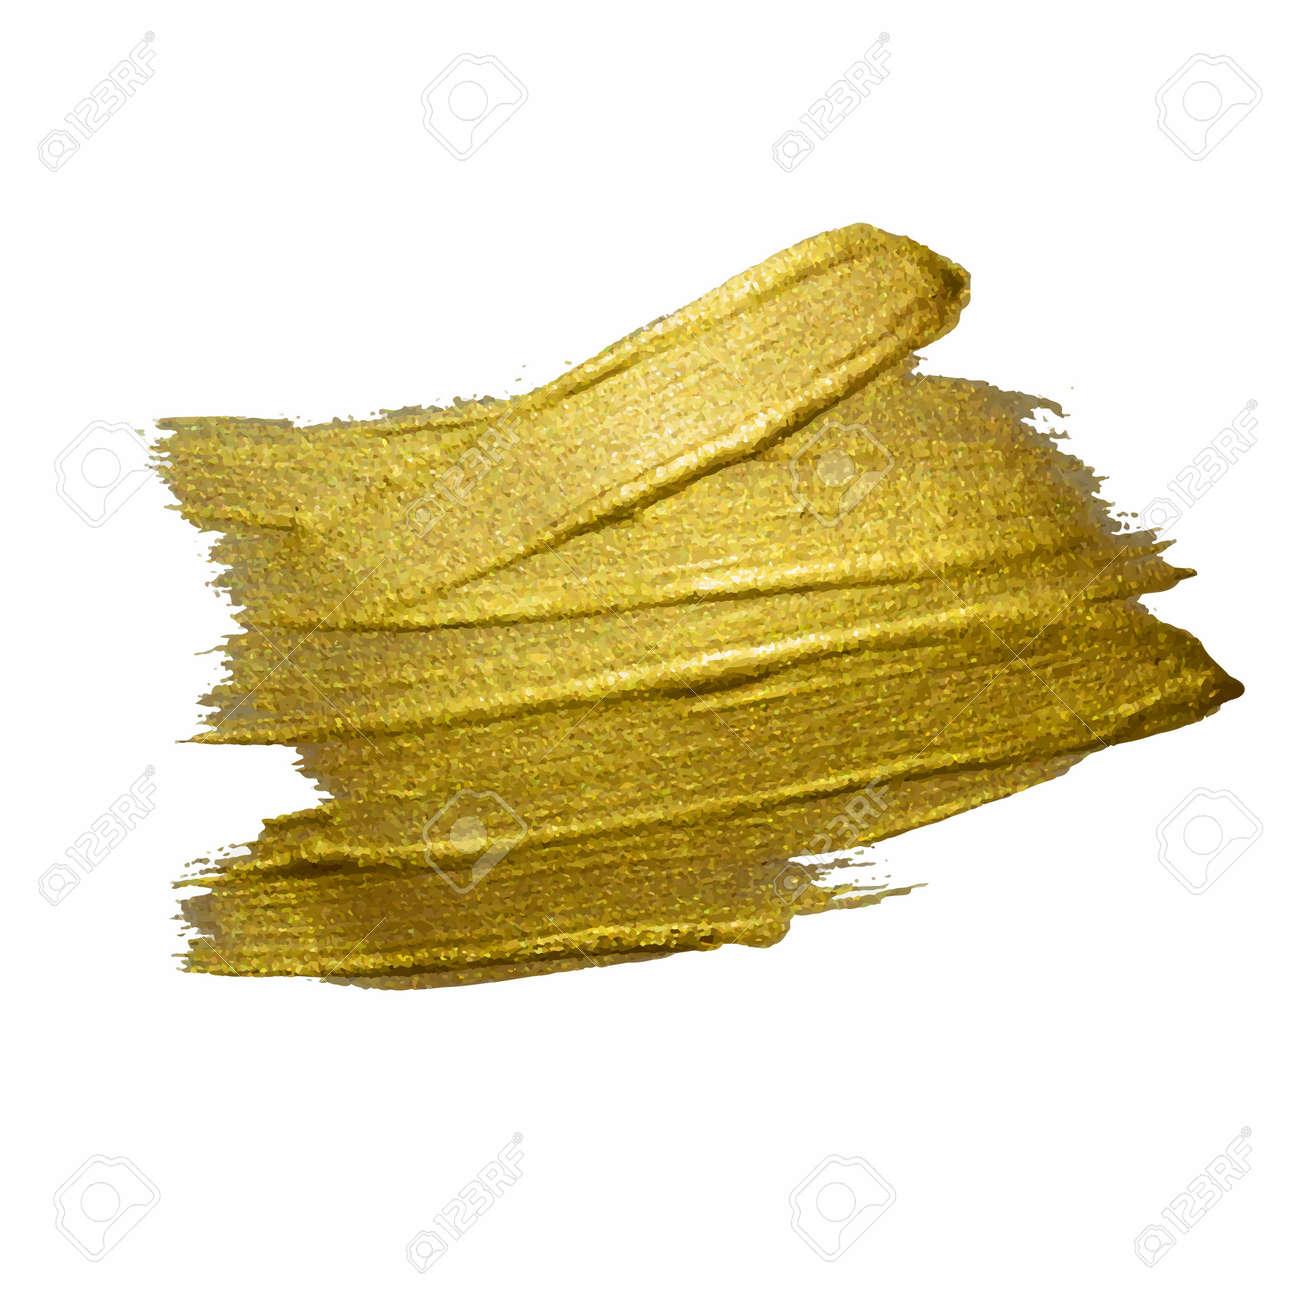 Gold Texture Paint Stain Illustration. Hand drawn brush stroke design elements. Abstract gold glittering textured art illustration. - 128111973